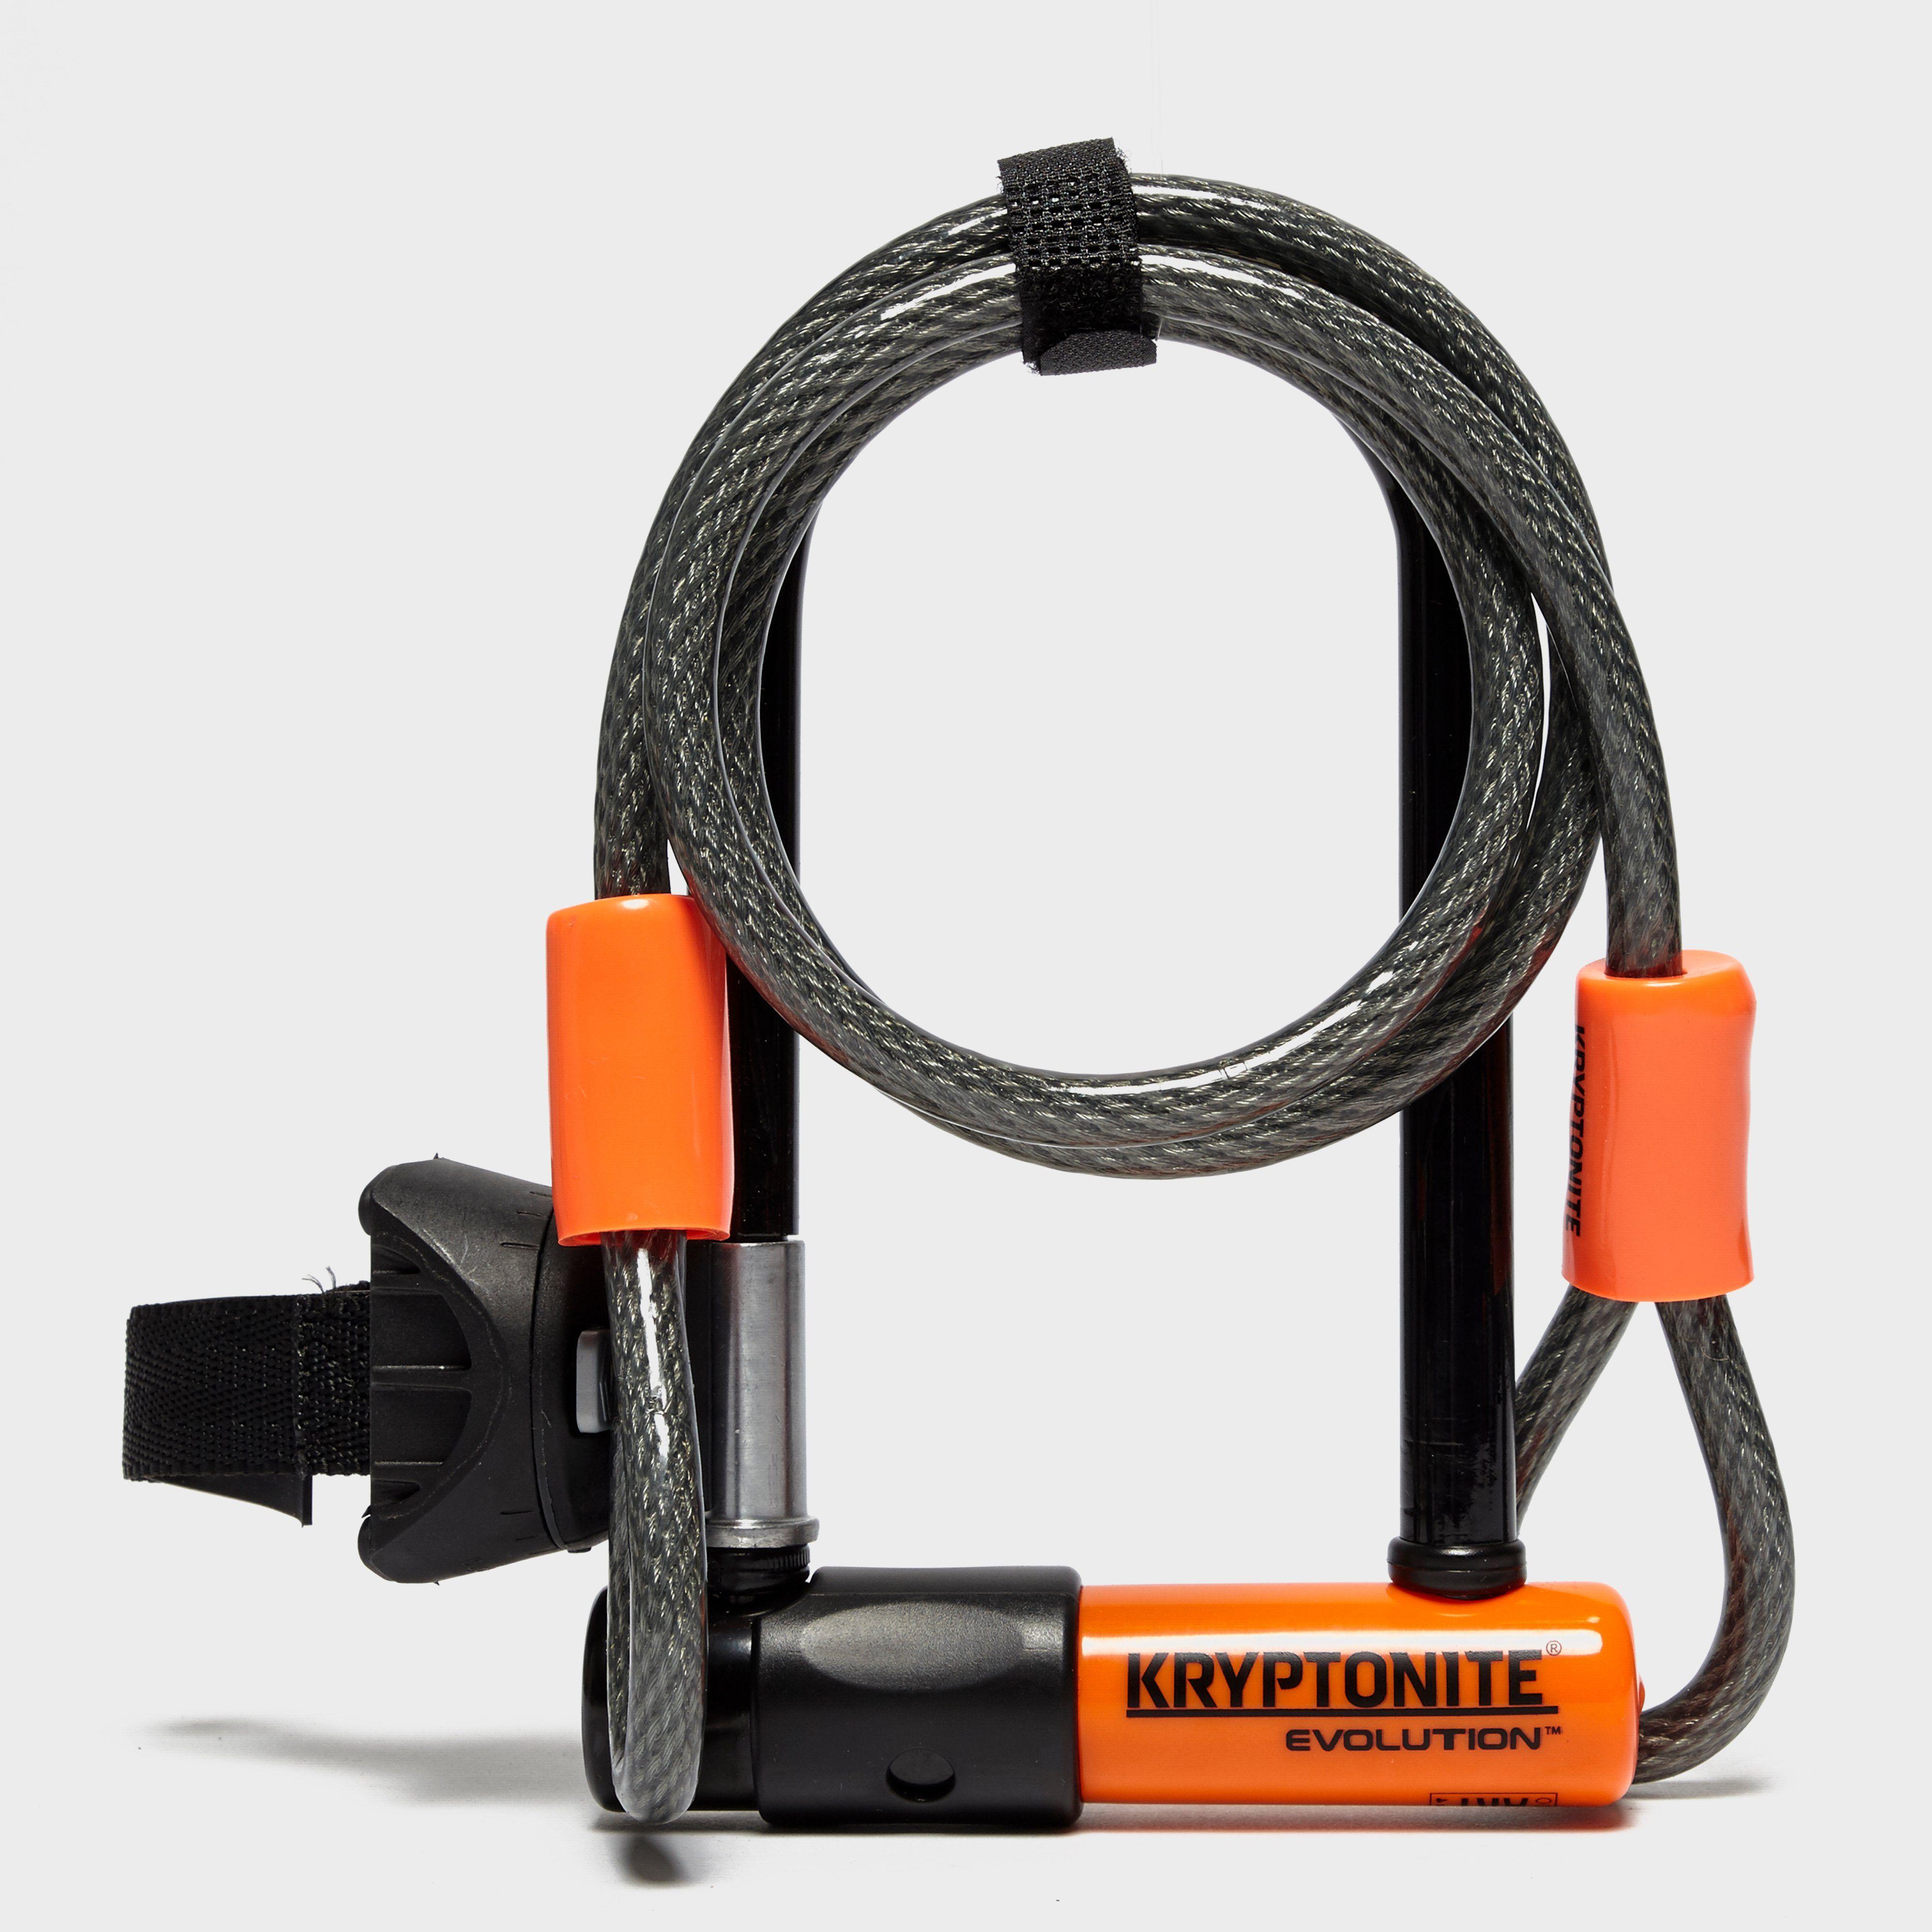 KRYPTONITE Evolution Mini 7 Lock with 4 Foot Kryptoflex Cable Combo